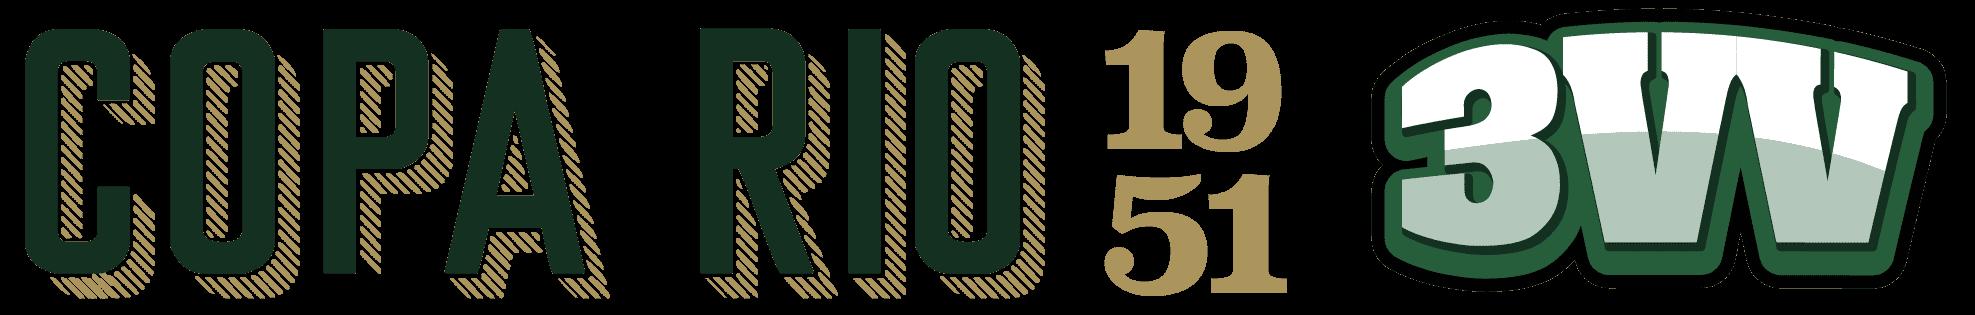 Copa Rio 1951 3VV